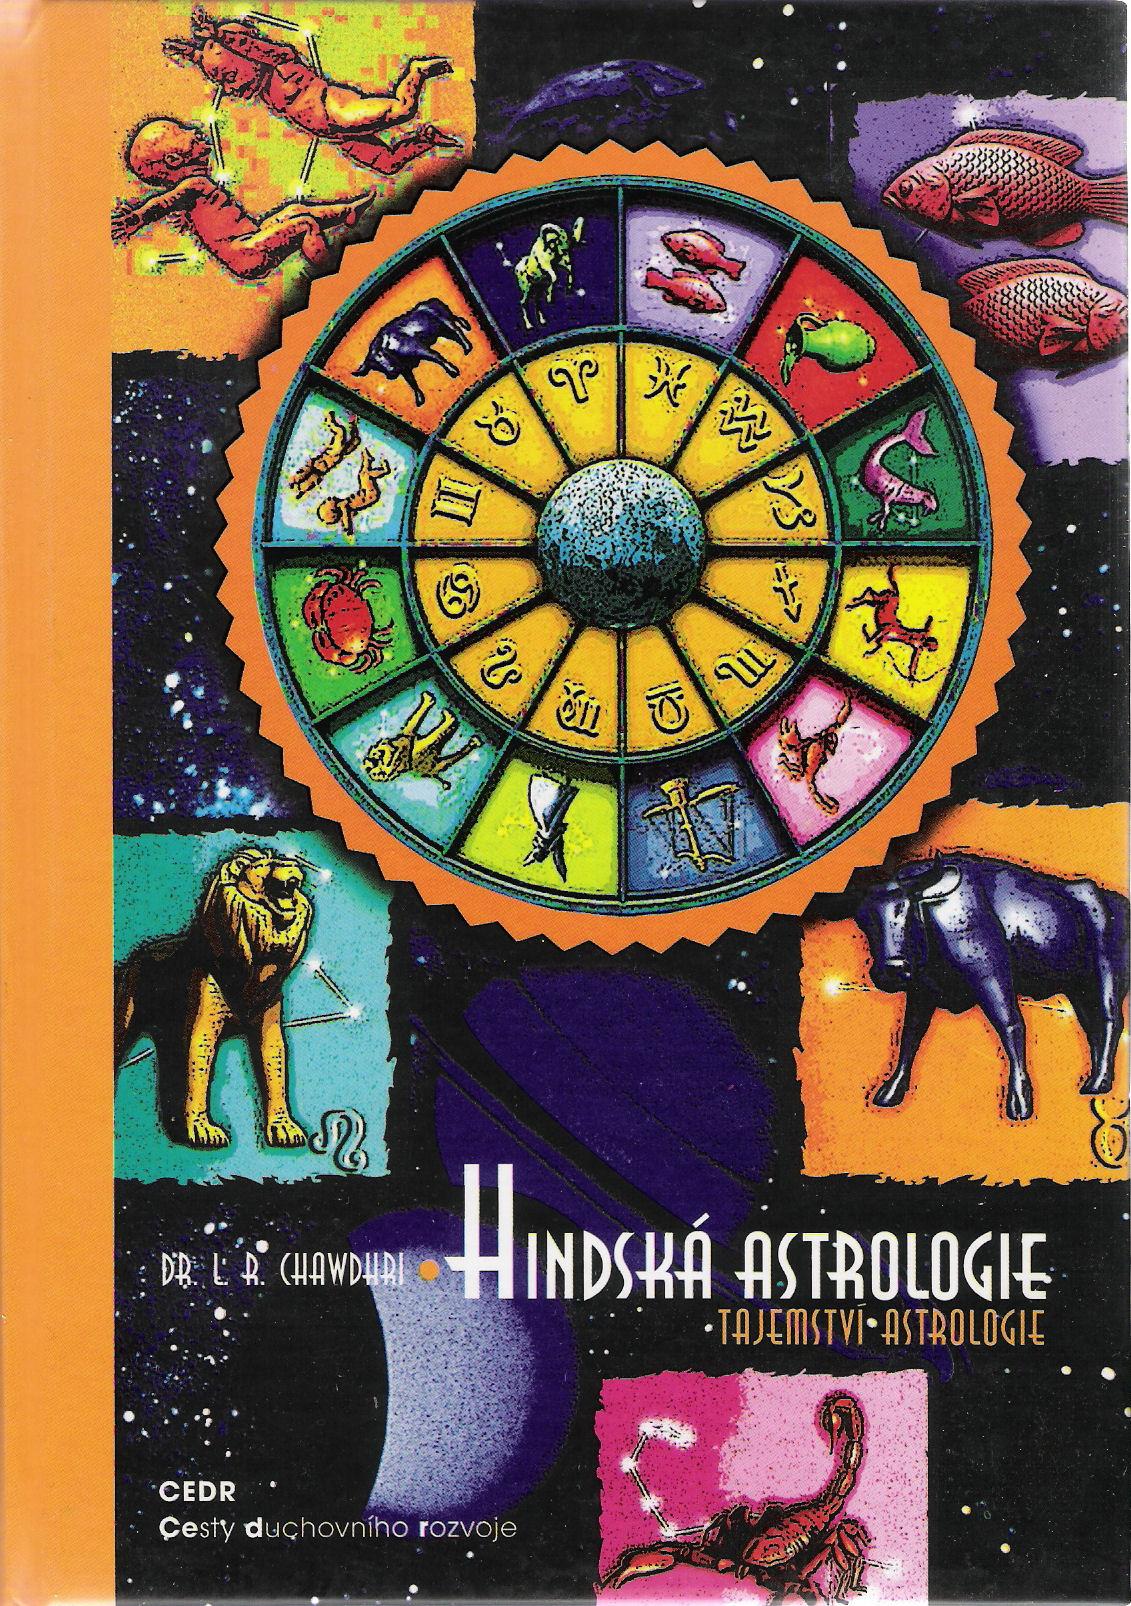 Hindská astrologie - Tajemství astrologie